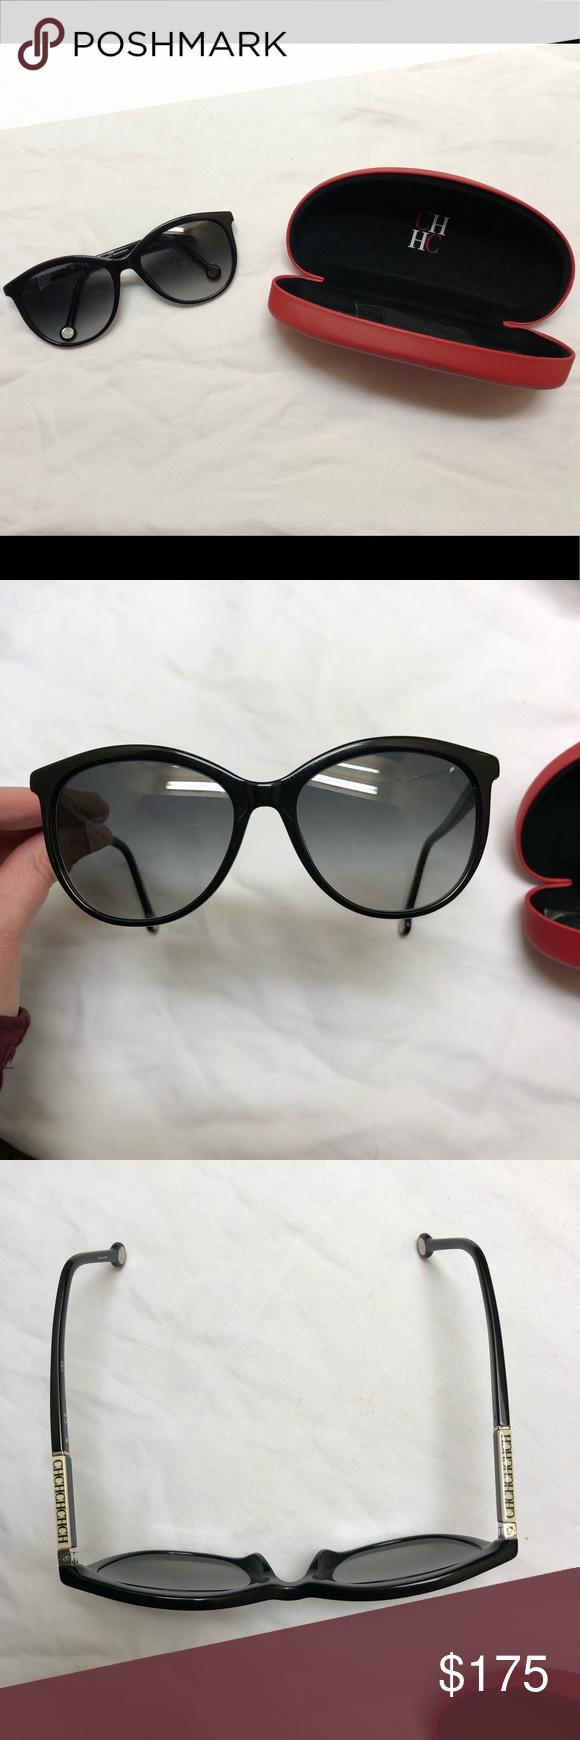 8a5a5533e6b6 Brand NEW Carolina Herrera sunglasses Black